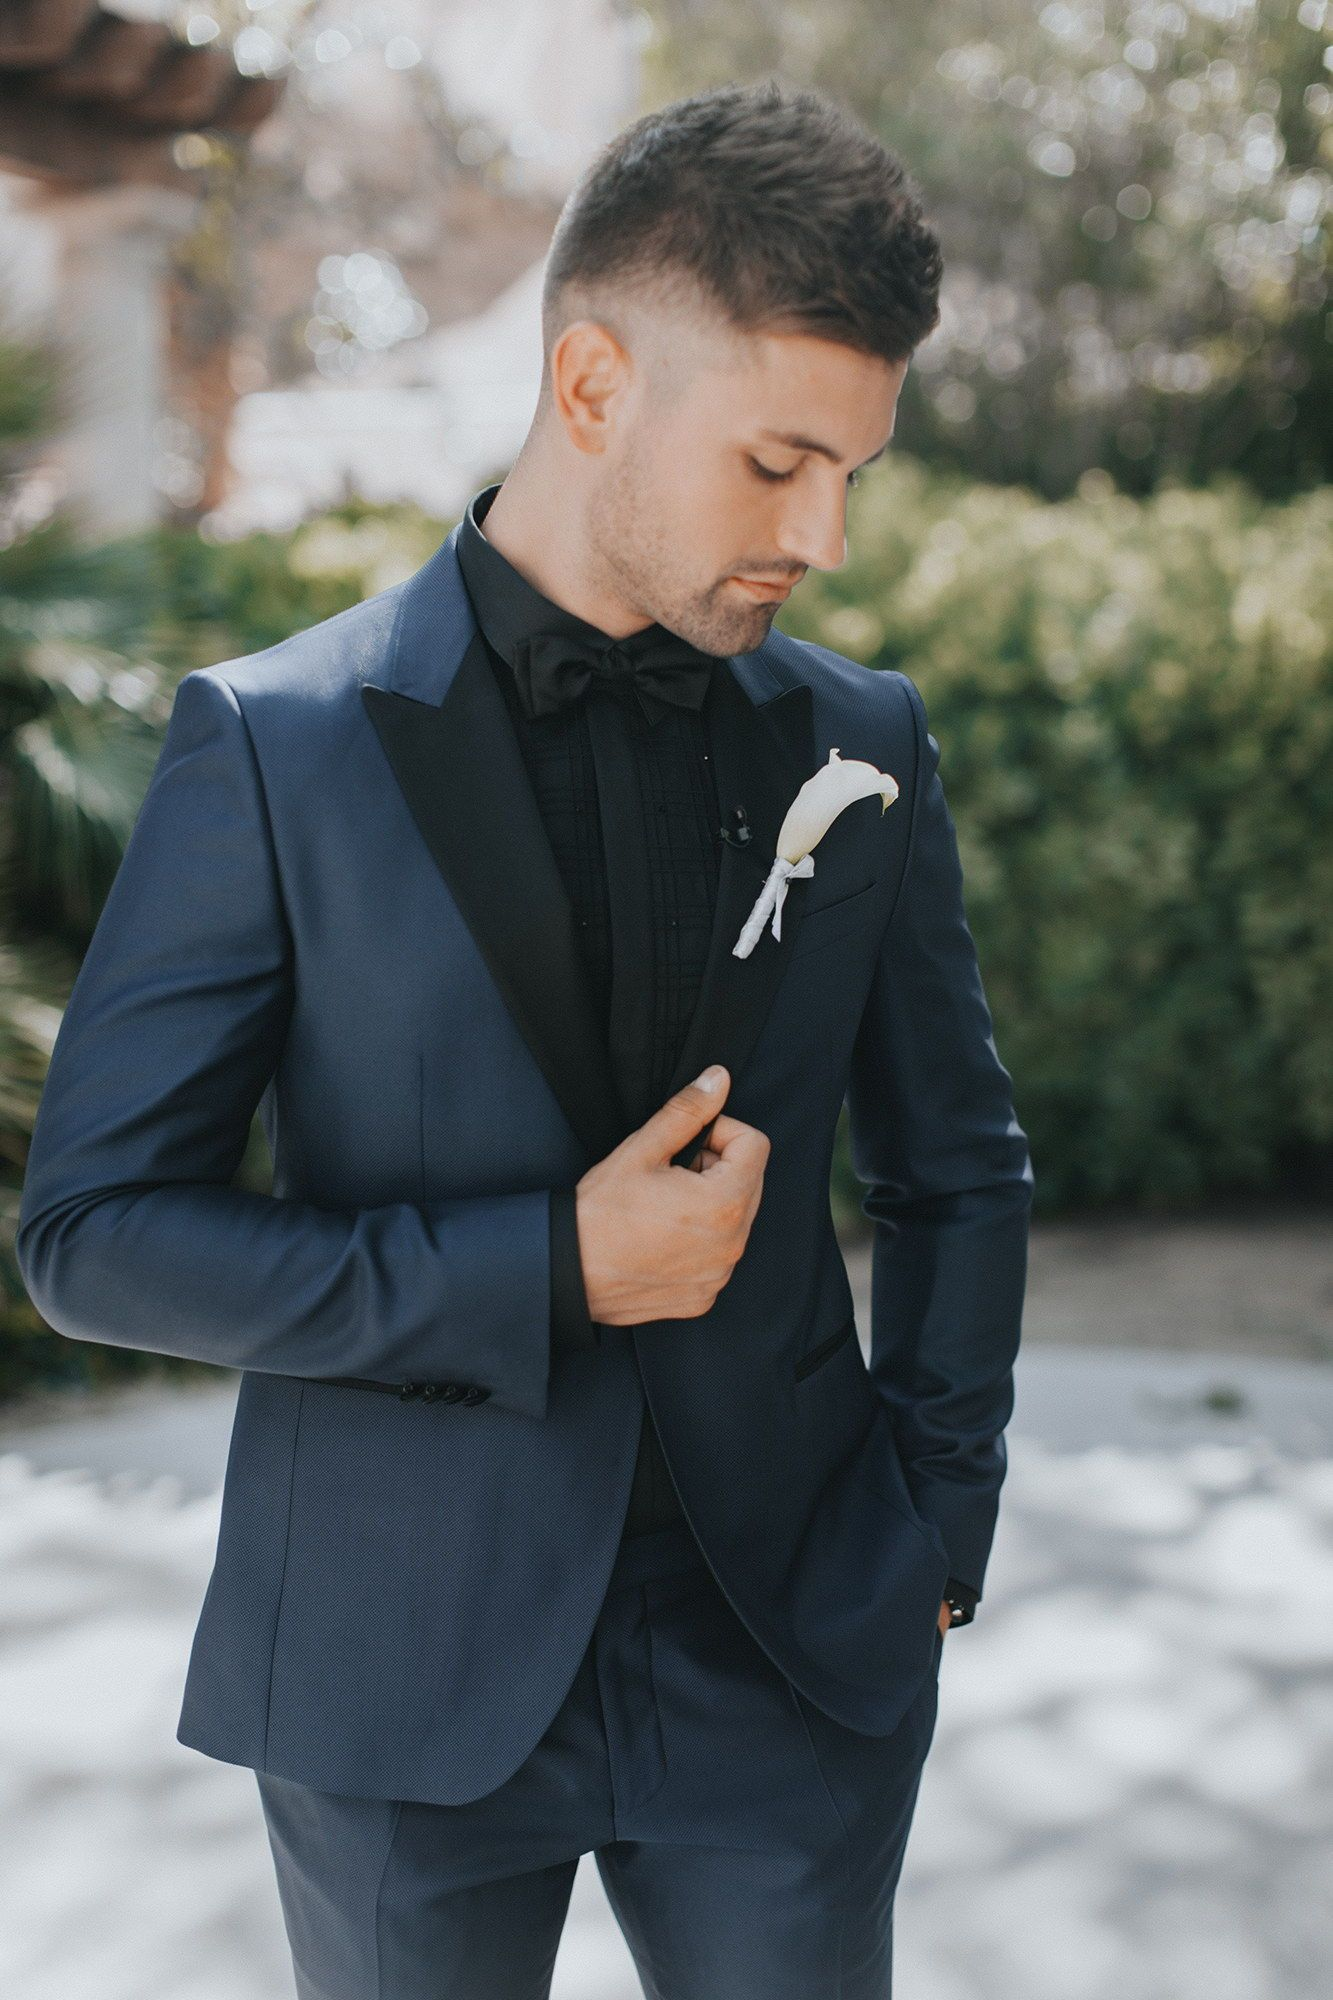 b4e645c408a2 Groom wearing a Hugo Boss dark blue suit at the Reflection Bay Golf Club in  Las Vegas. | Jhonathan and Michael's Black Tie Las Vegas Wedding ...